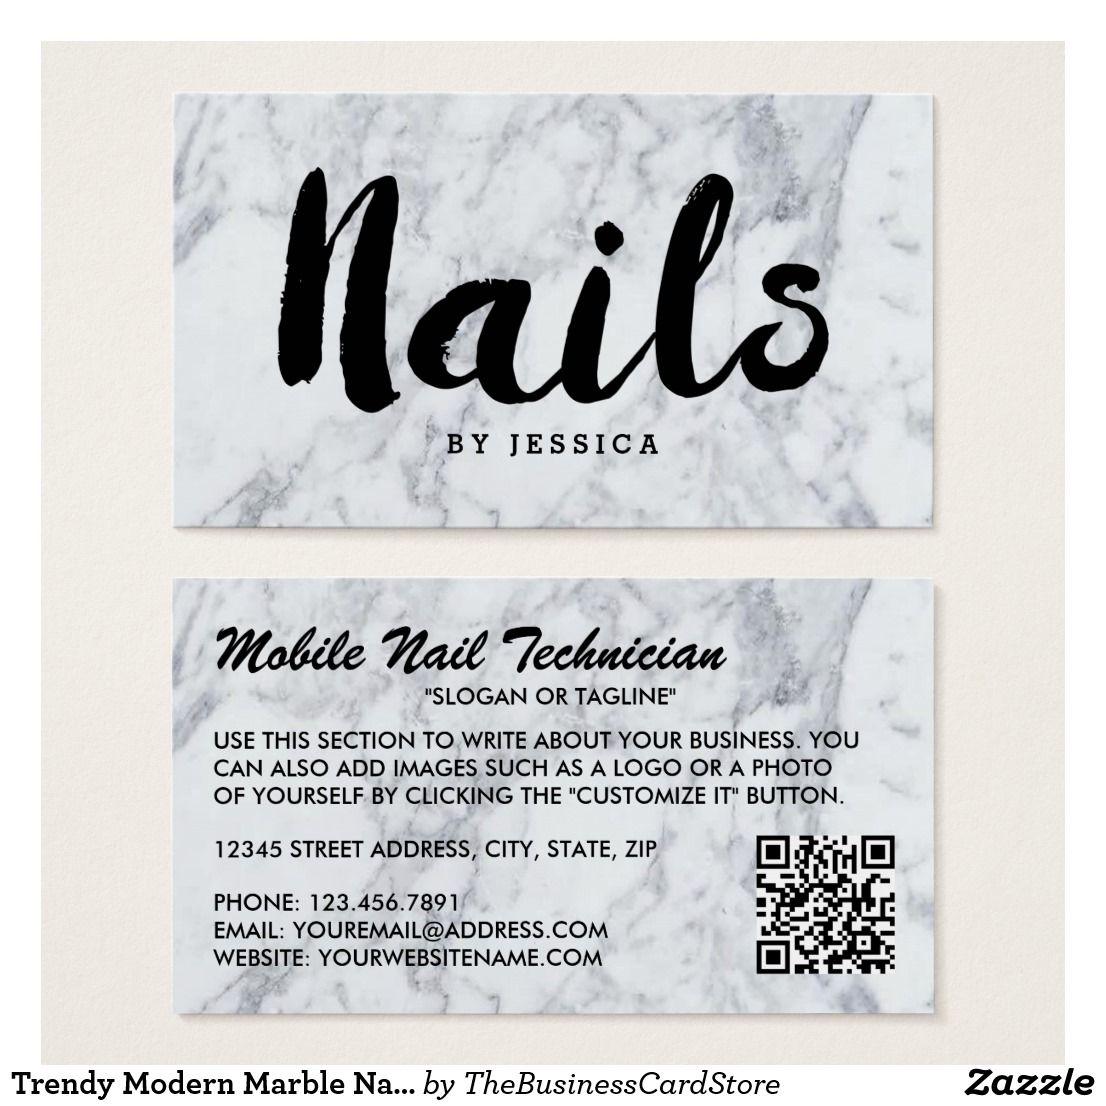 Trendy Modern Marble Nail Technician Business Card   Pinterest ...